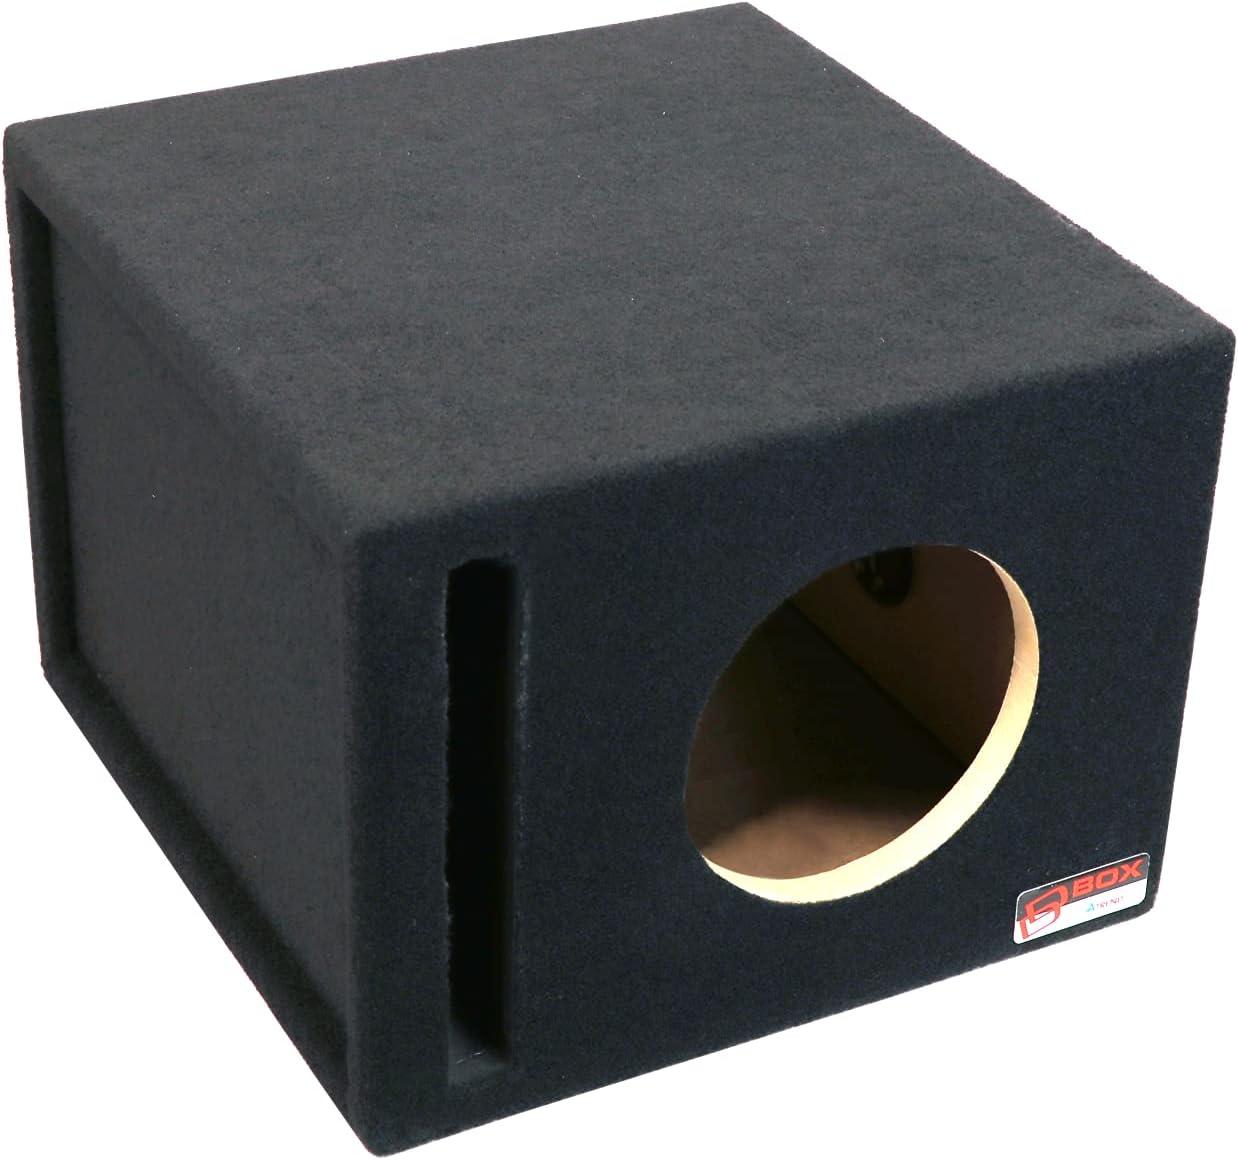 "SQ-8SQVDD Soundqubed 8"" Woofer - Best 8 Inch Subwoofer Box"